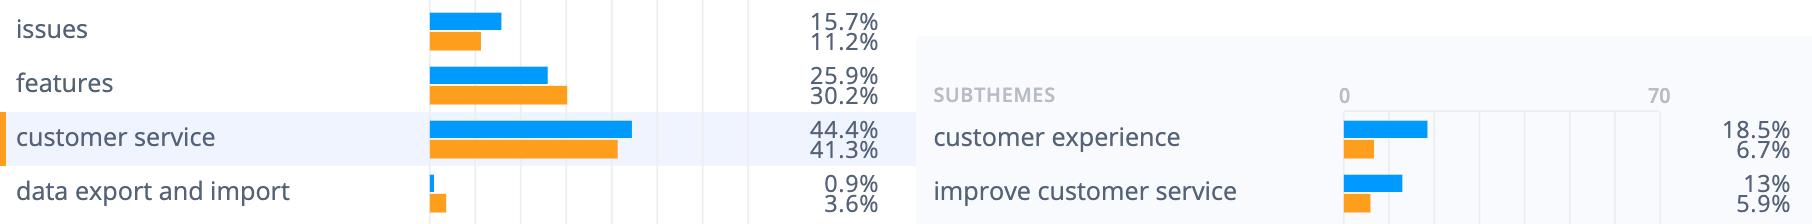 Medallia survey tool strengths: Customer experience 18.5%